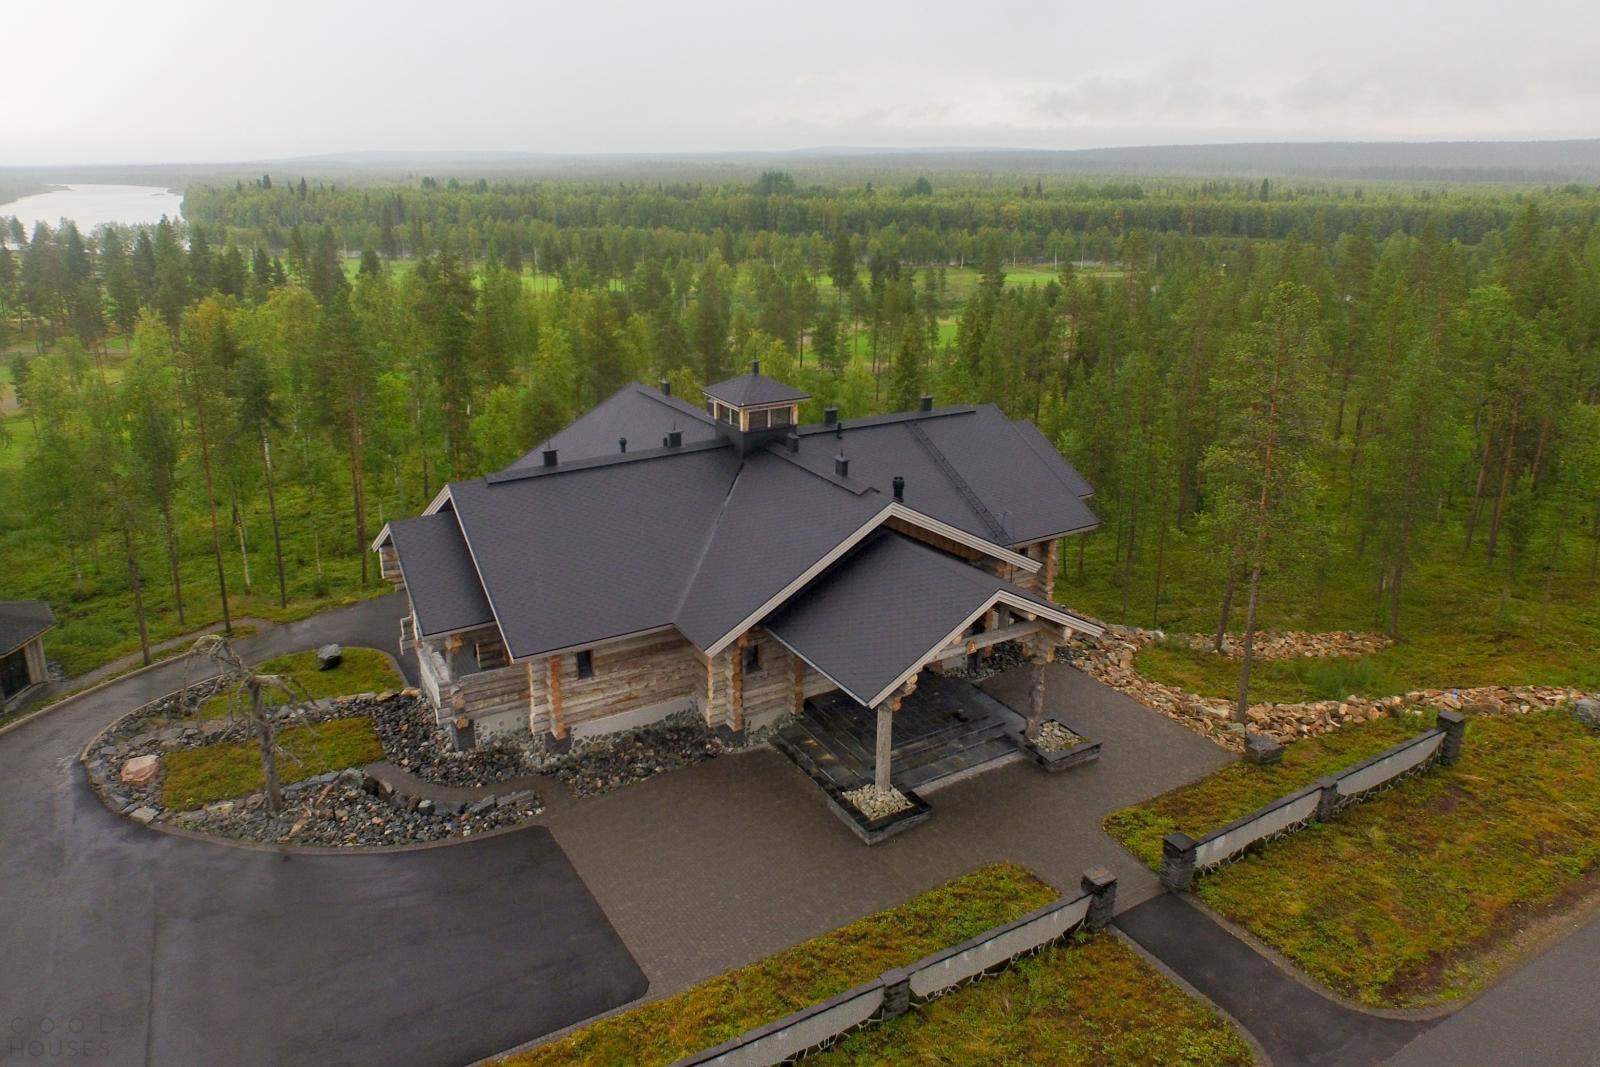 Эксклюзивная вилла за $ 4,4 млн. в Финляндии